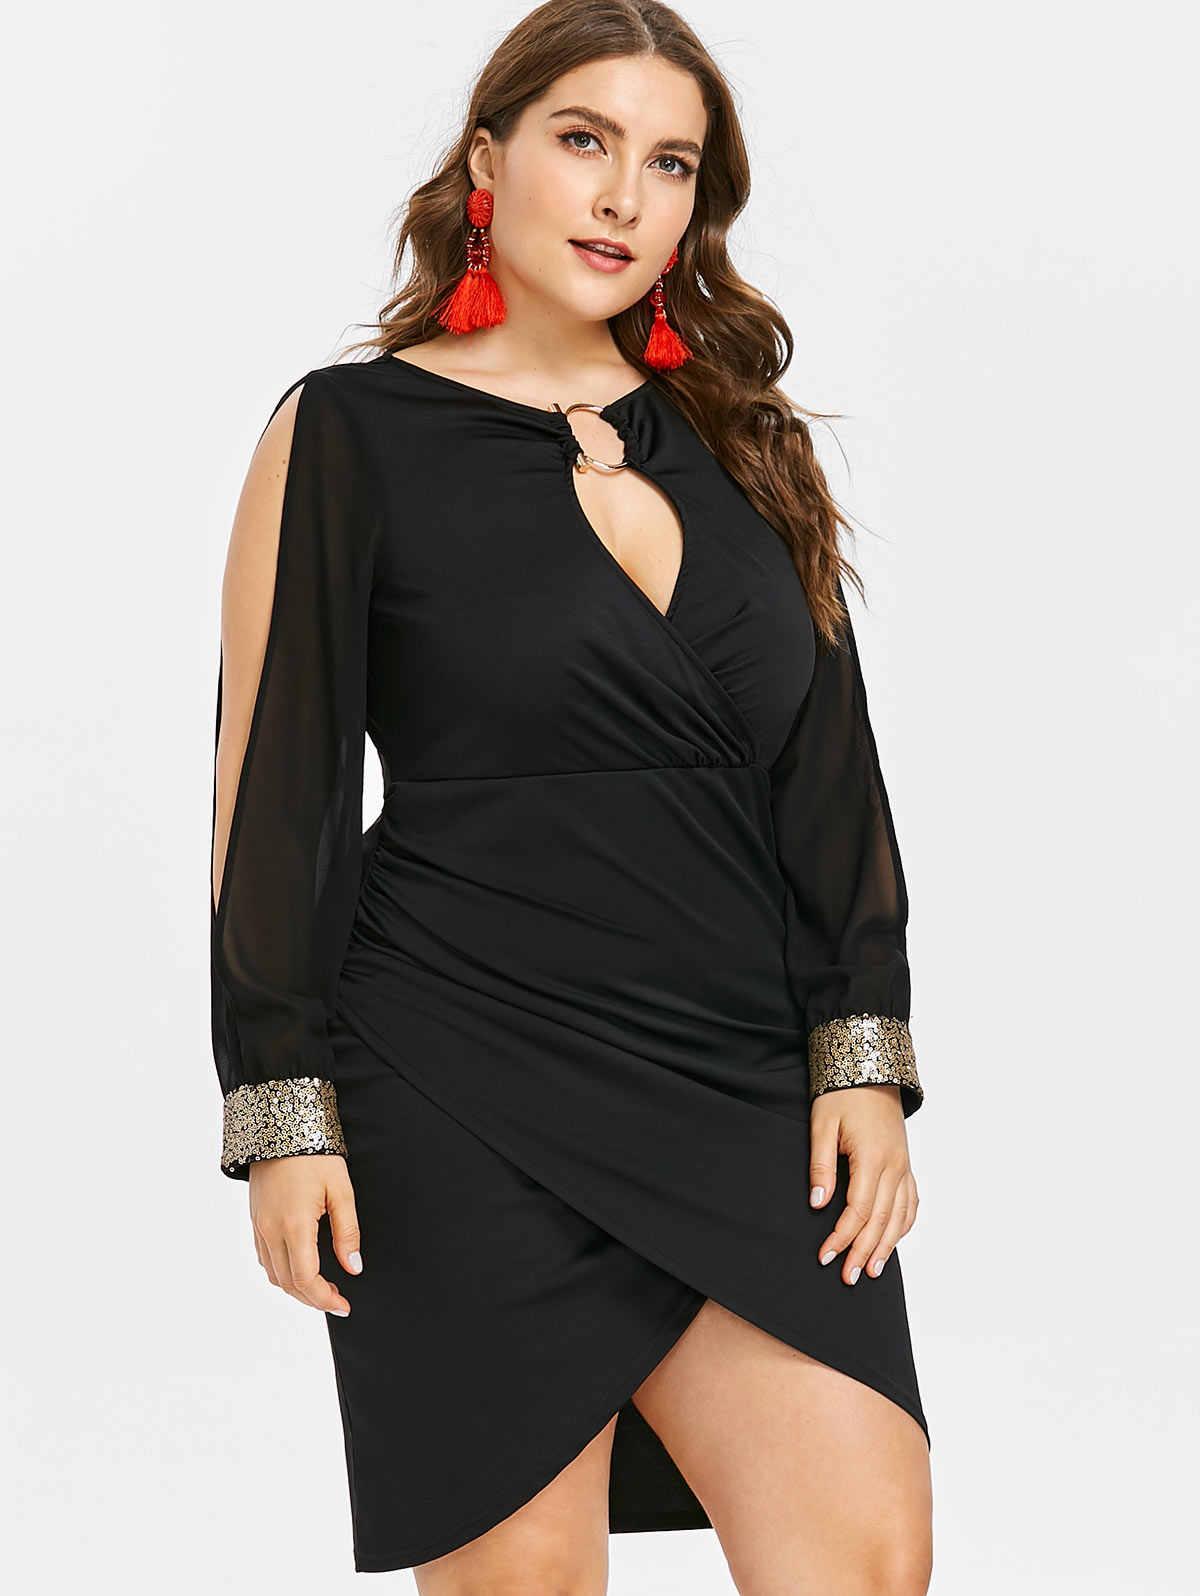 33d4ff7bccf Wipalo Slit Sleeve Plus Size O-Ring Sequin Embellished Bodycon Dress  Elegant Solid Slip Front